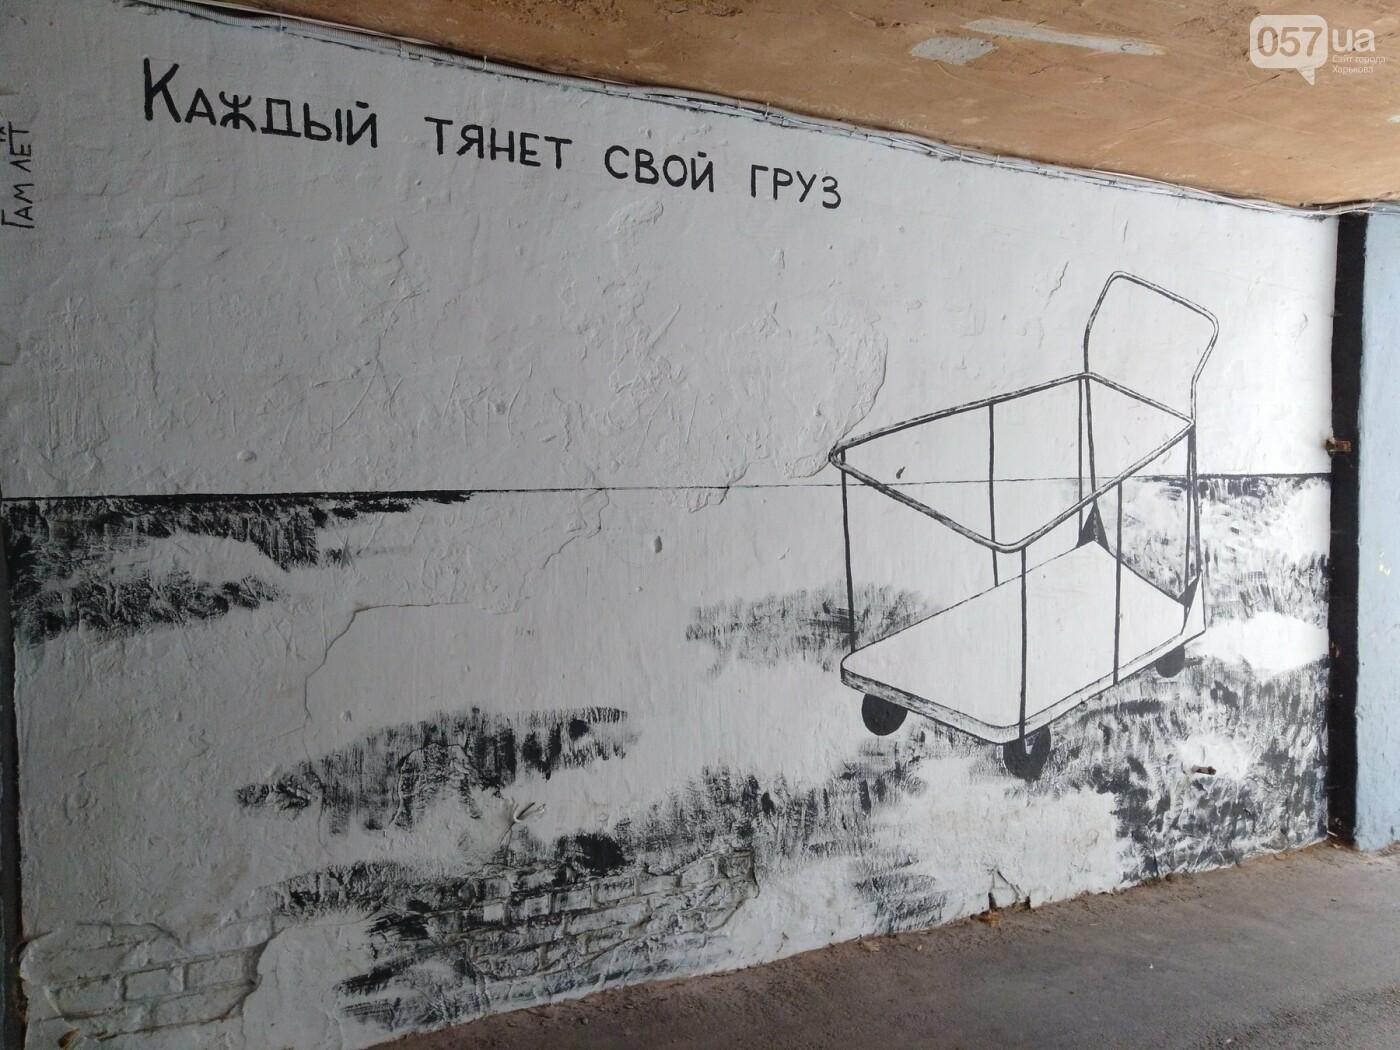 Стрит-арт Гамлета в Харькове: ТОП-10 граффити художника, - ФОТО, фото-6